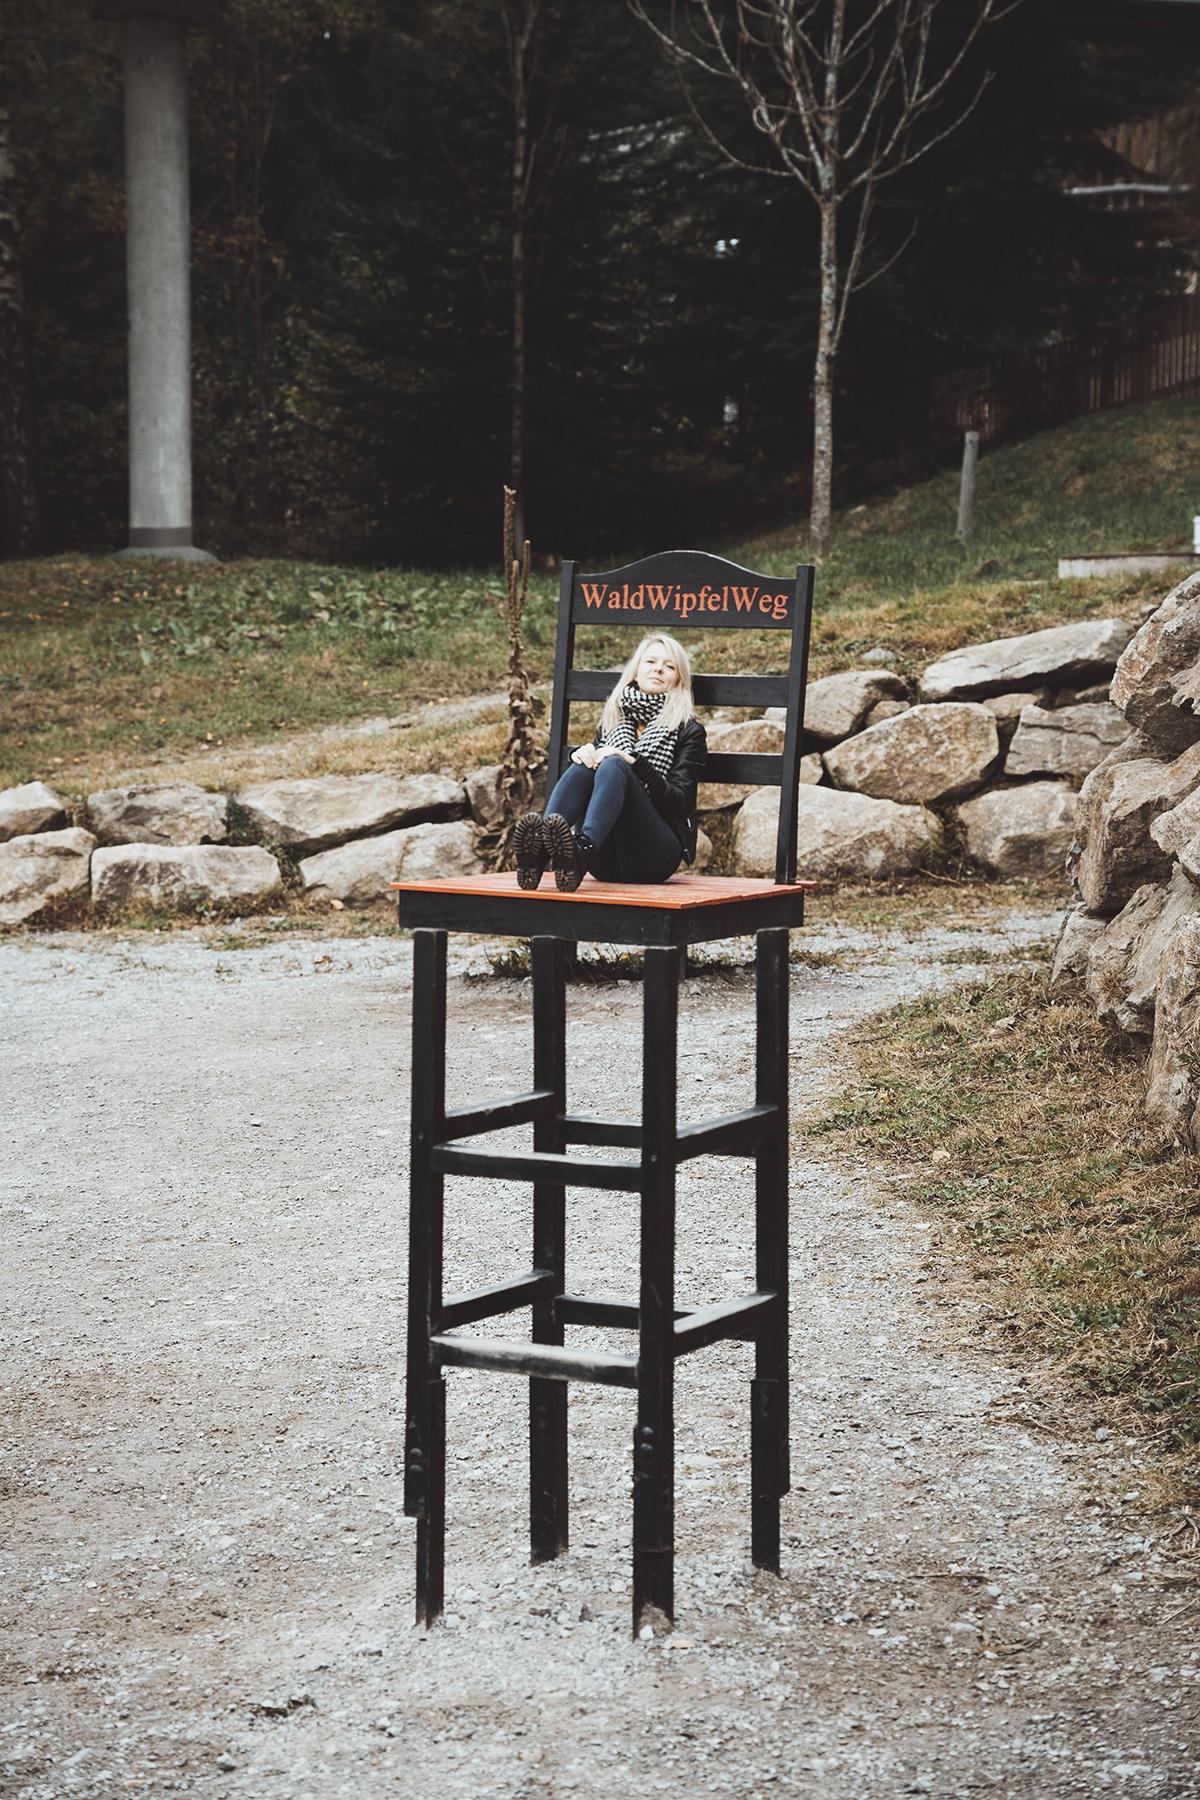 sankt-engelmar-waldwipfelweg-illusion-stuhl